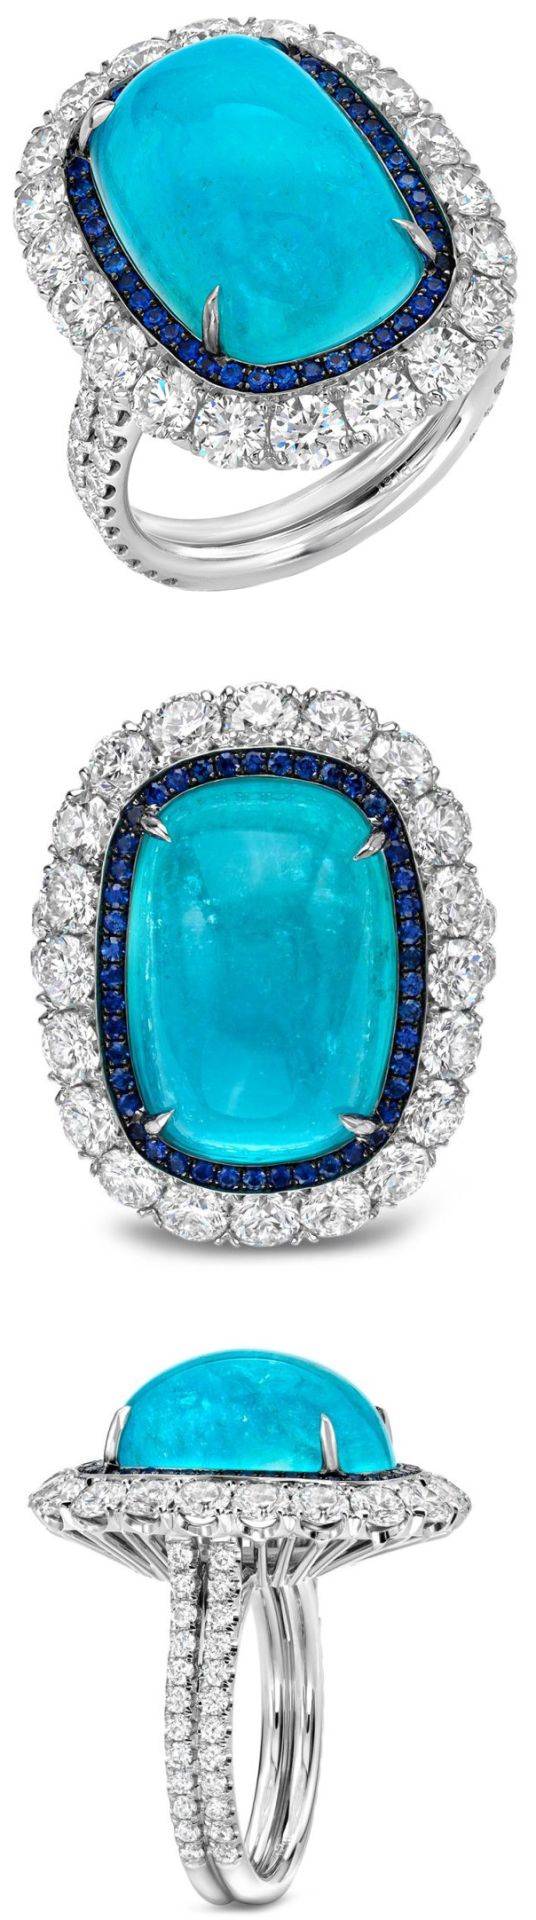 【Jewelry in My Box】Glorious Paraiba Tourmaline, Sapphire and Diamond Ring by Tamir Jewels | 1stdibs.com